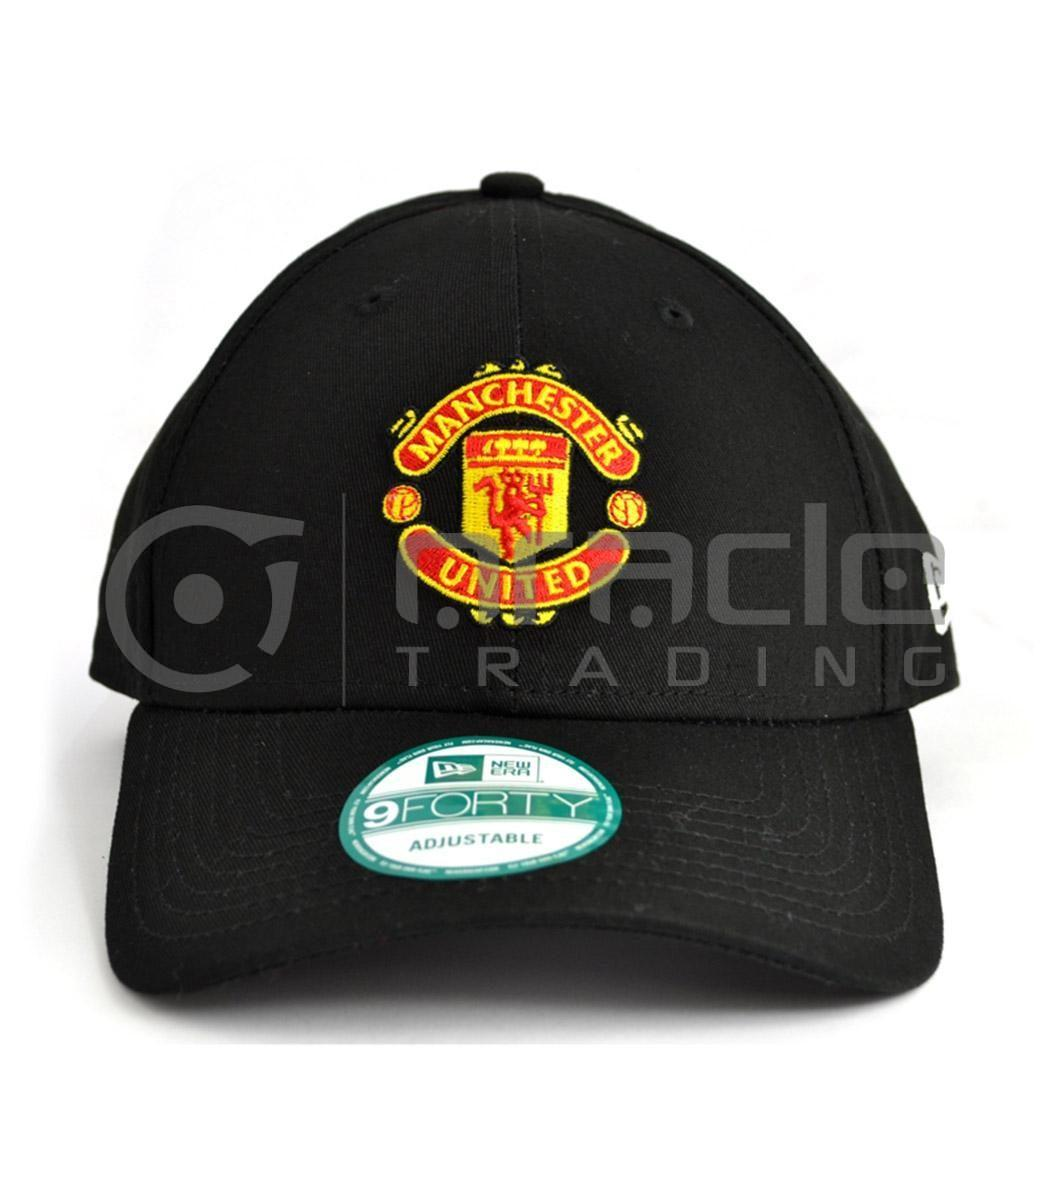 Manchester United Black Crest Hat - New Era